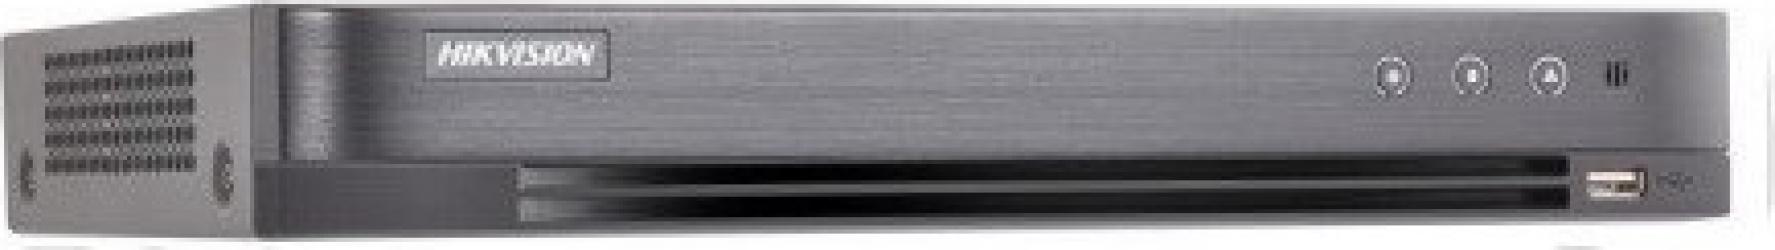 DVR 16 canale Turbo HD 3.0 Hikvision - DS-7216HQHI-F2/N/A/16 TVI/ AHD/ Analog + 2 camere IP de pana la 2MP 2xSATA